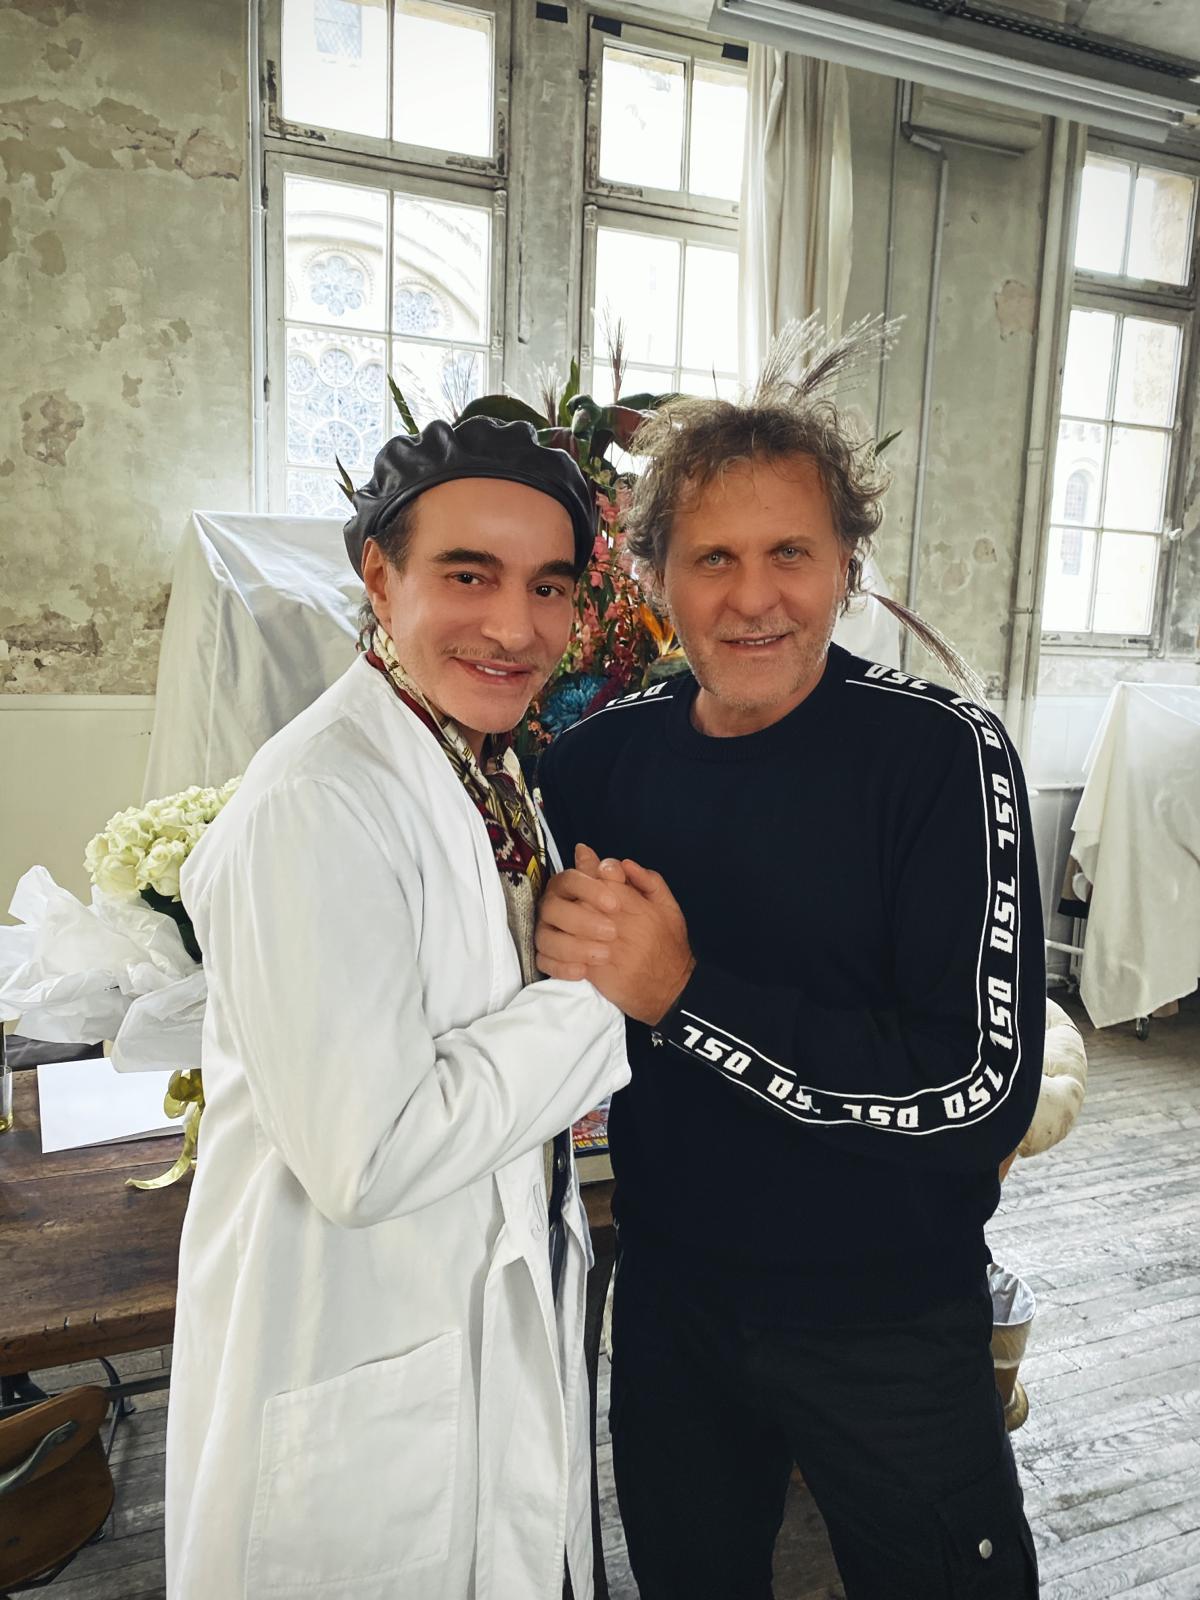 John Galliano Renews His Contract at Maison Margiela